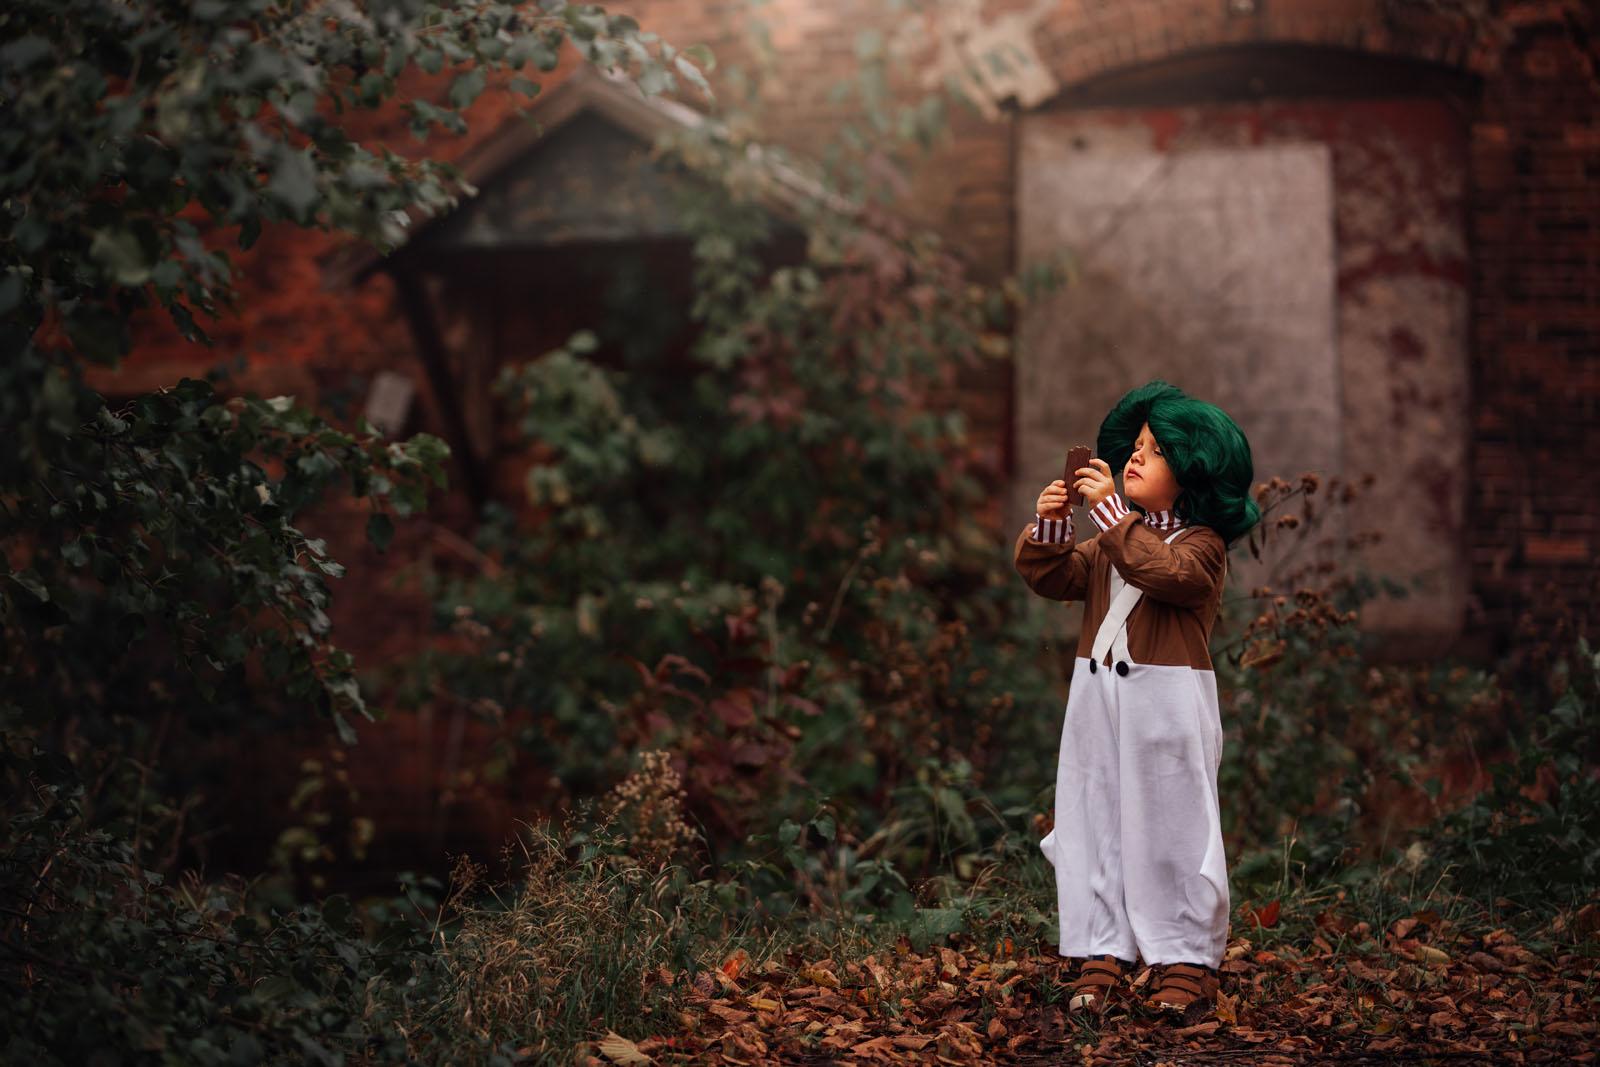 megloeks_image21 child in oompa loompa costume with chocolate fall activities by meg loeks